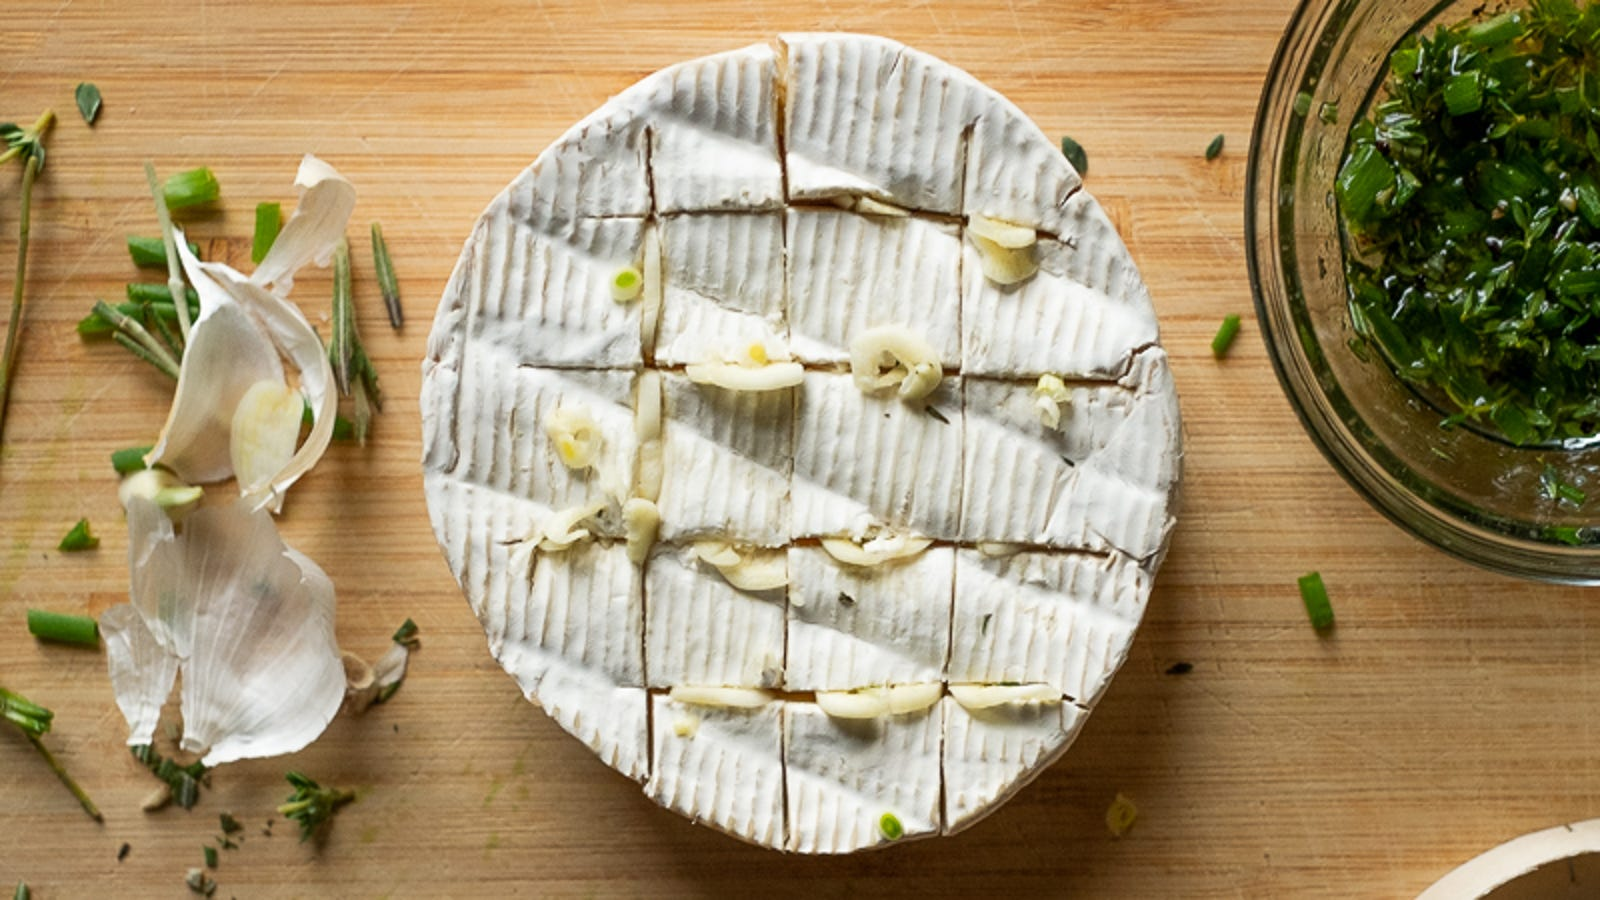 Slide sliced garlic right into the slits.